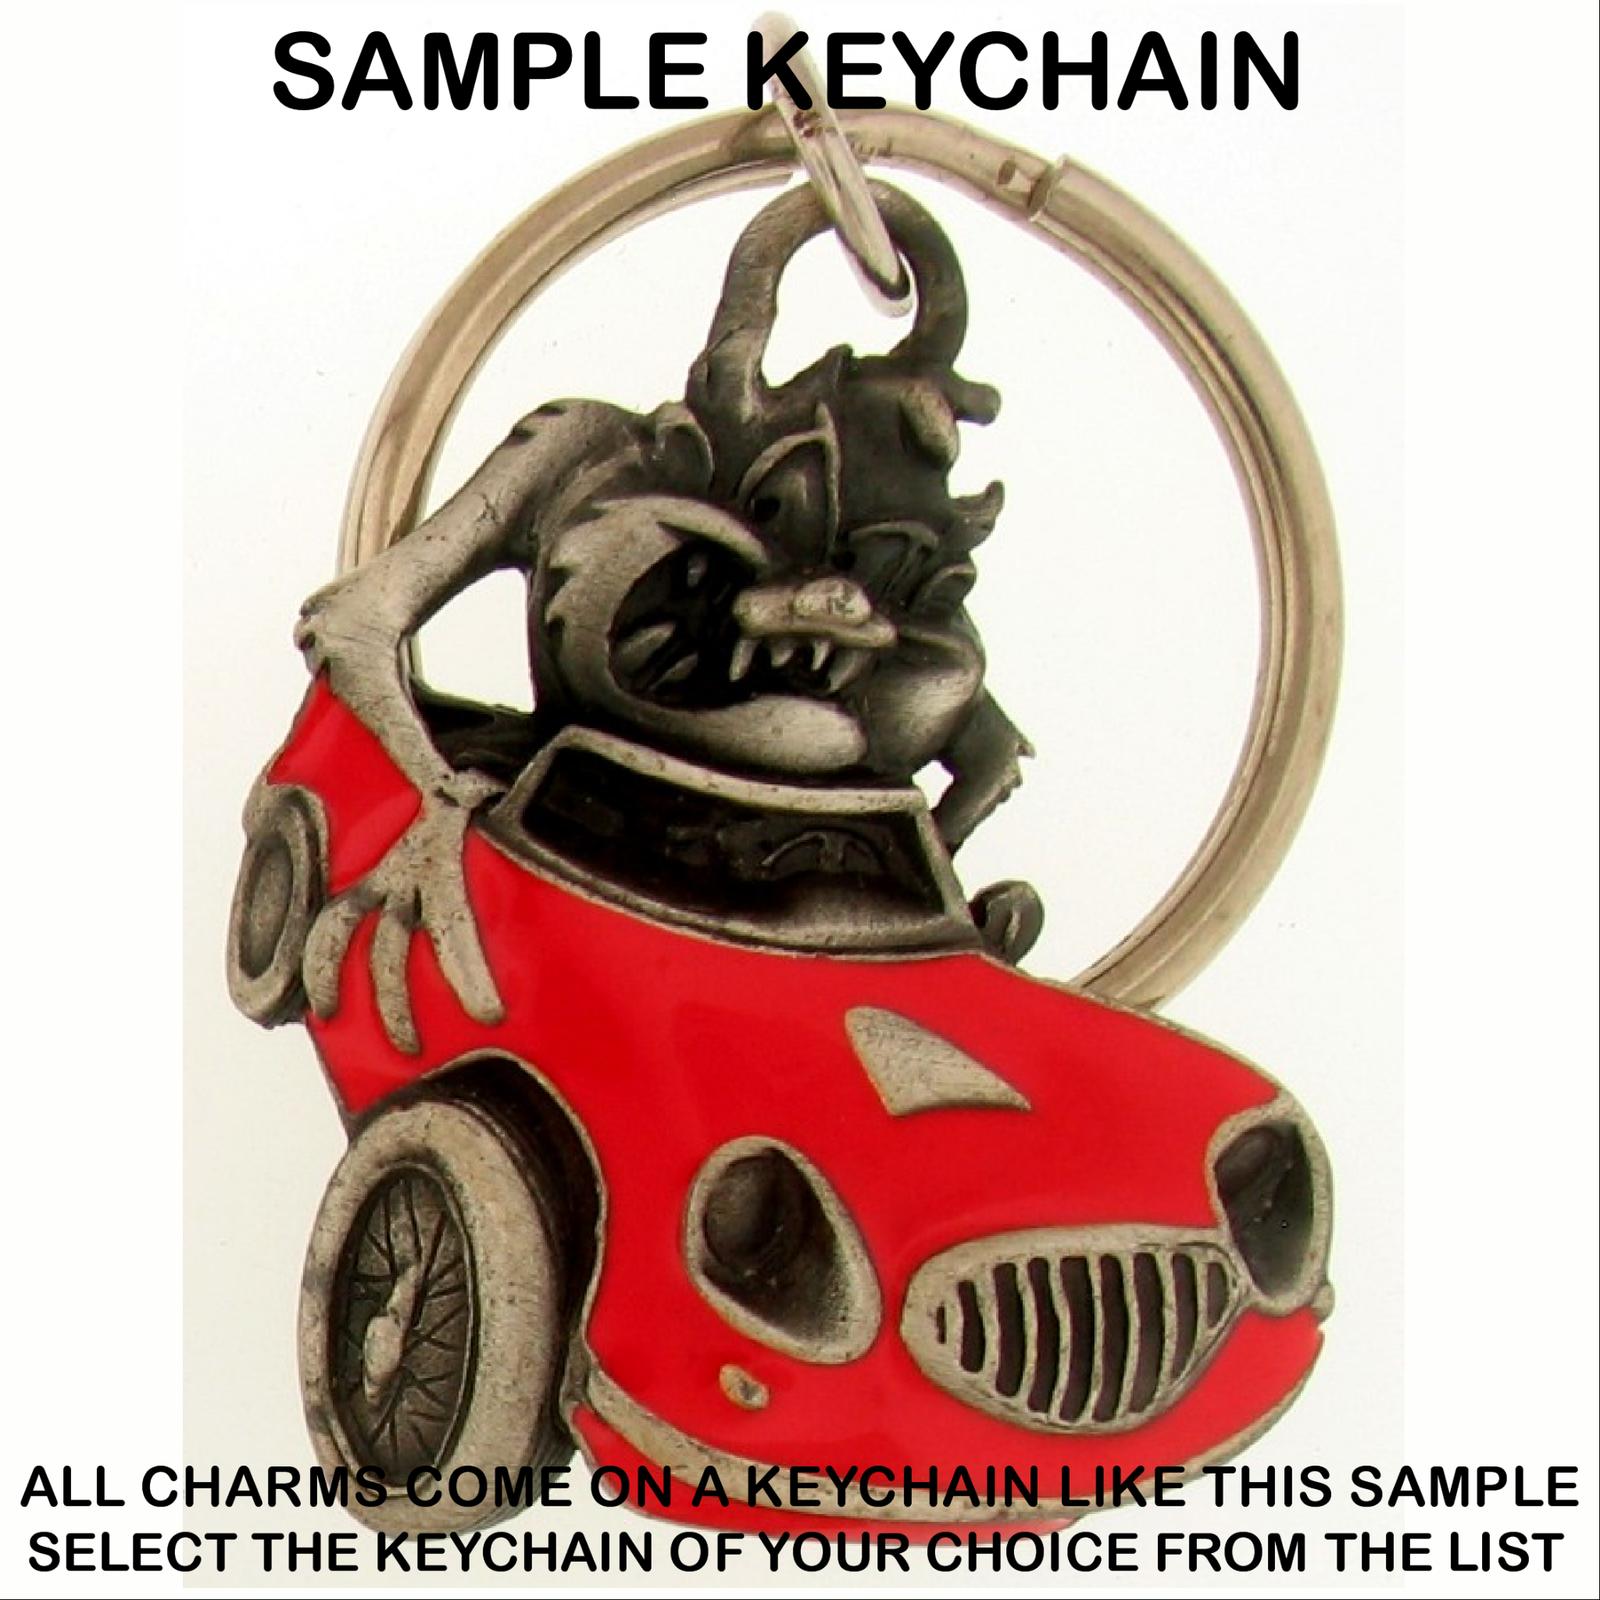 Keychain Taz TASMANIAN Devil LOONEY TUNES Warner Brothers Character Choice 0010w